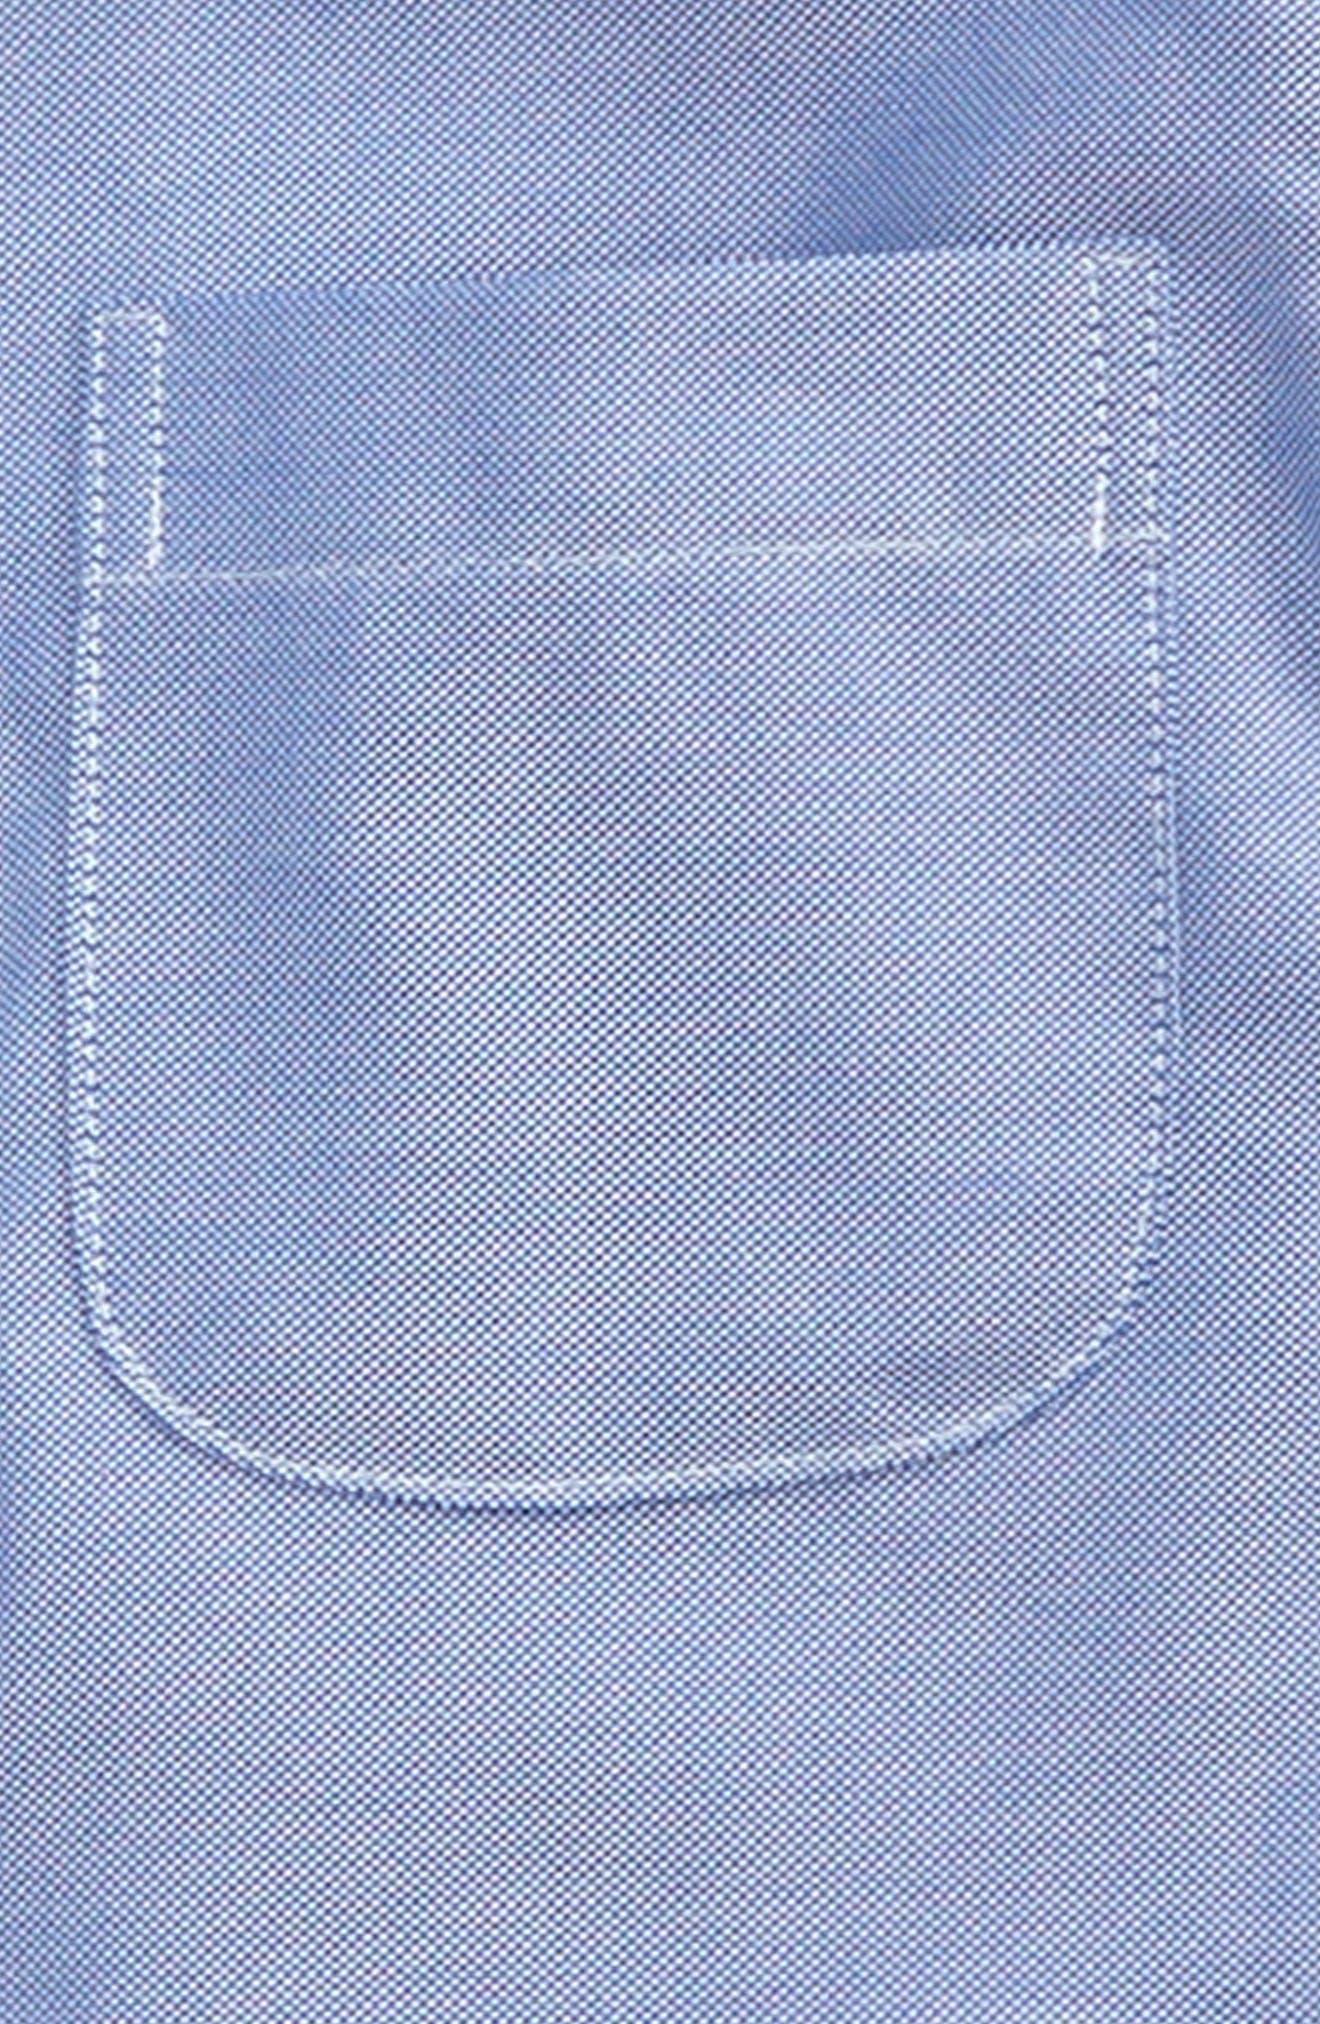 Alternate Image 2  - Nordstrom Check Dress Shirt (Big Boys)